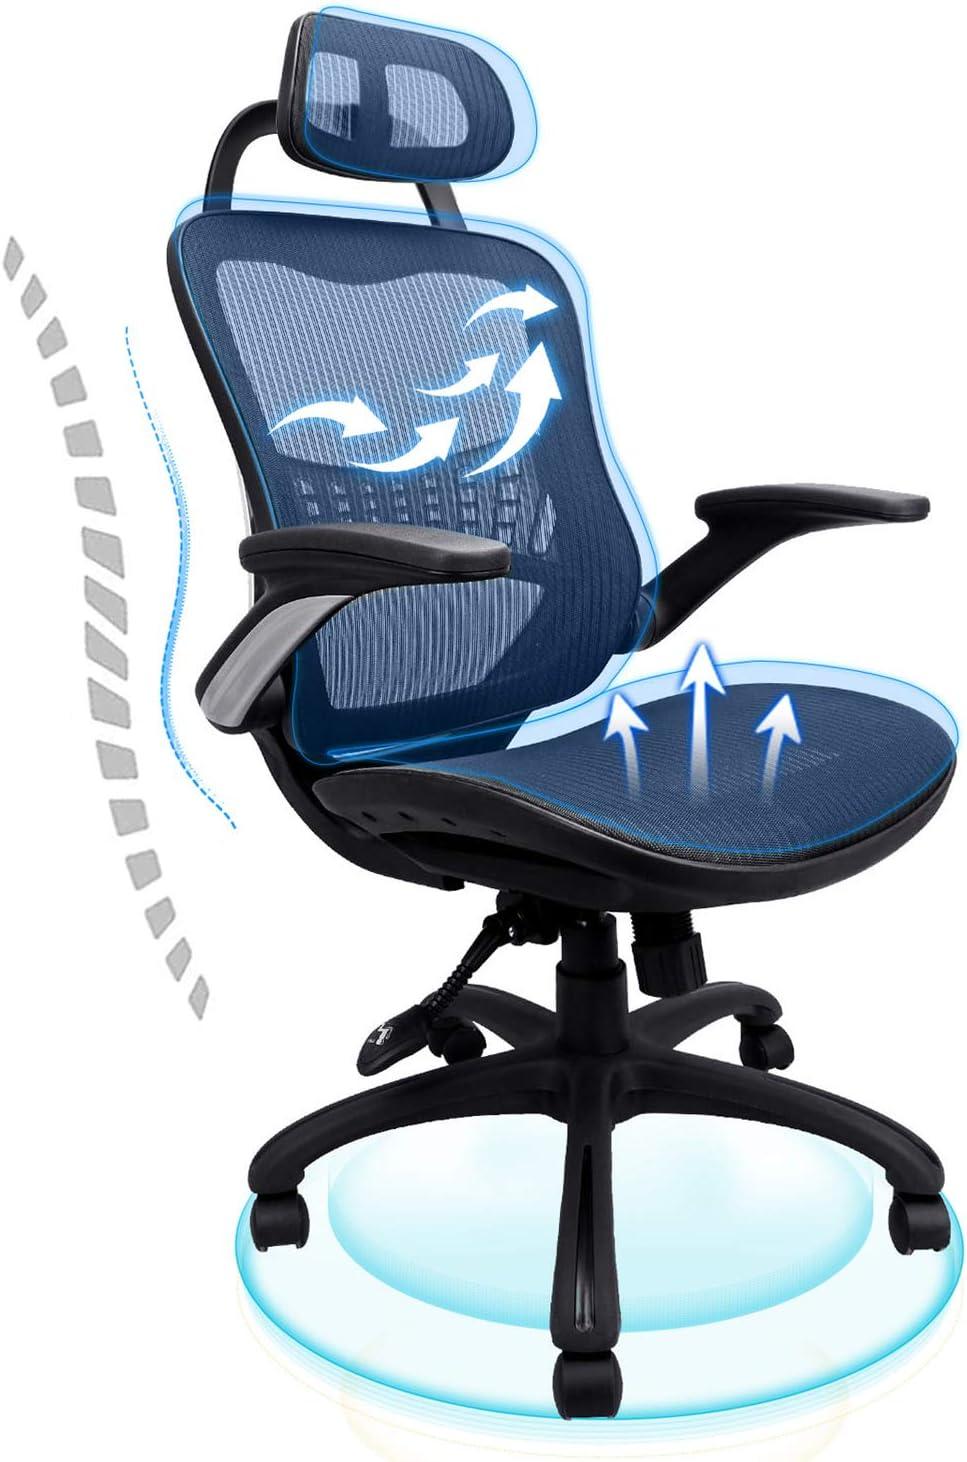 Office Chair Ergonomic Desk Komene Back Max 73% OFF Adjustable High Long Beach Mall He